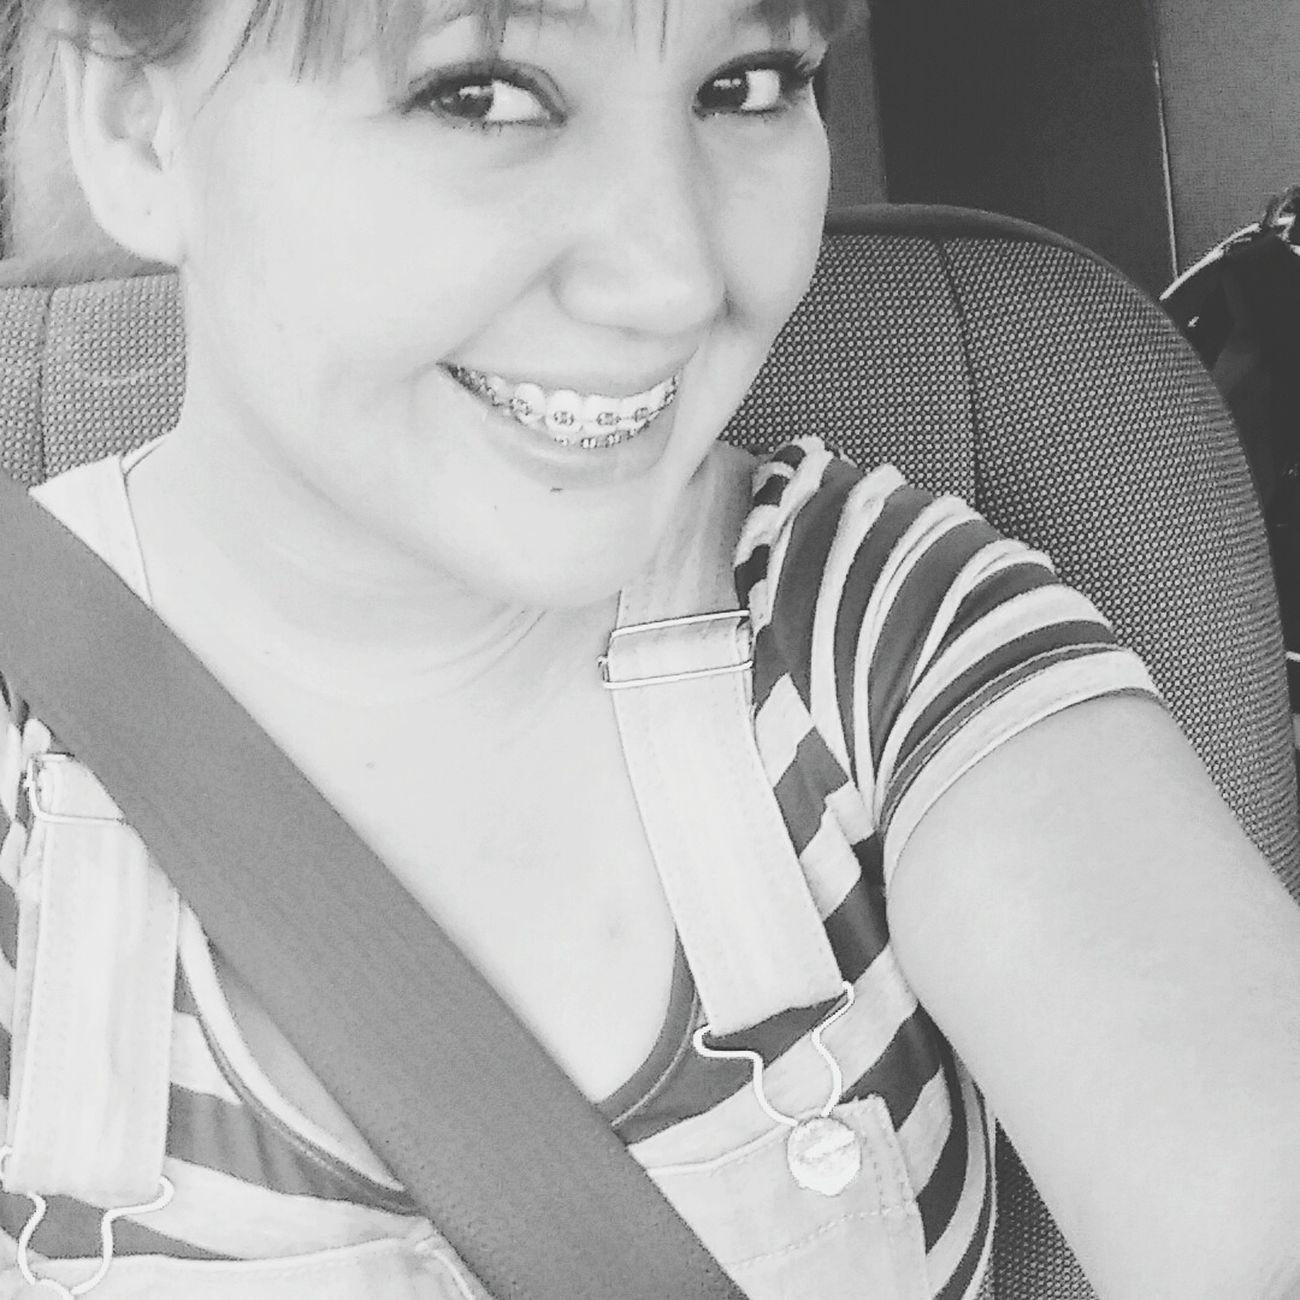 Sonrisa Smile ✌ VERANO♥ Selfie ✌